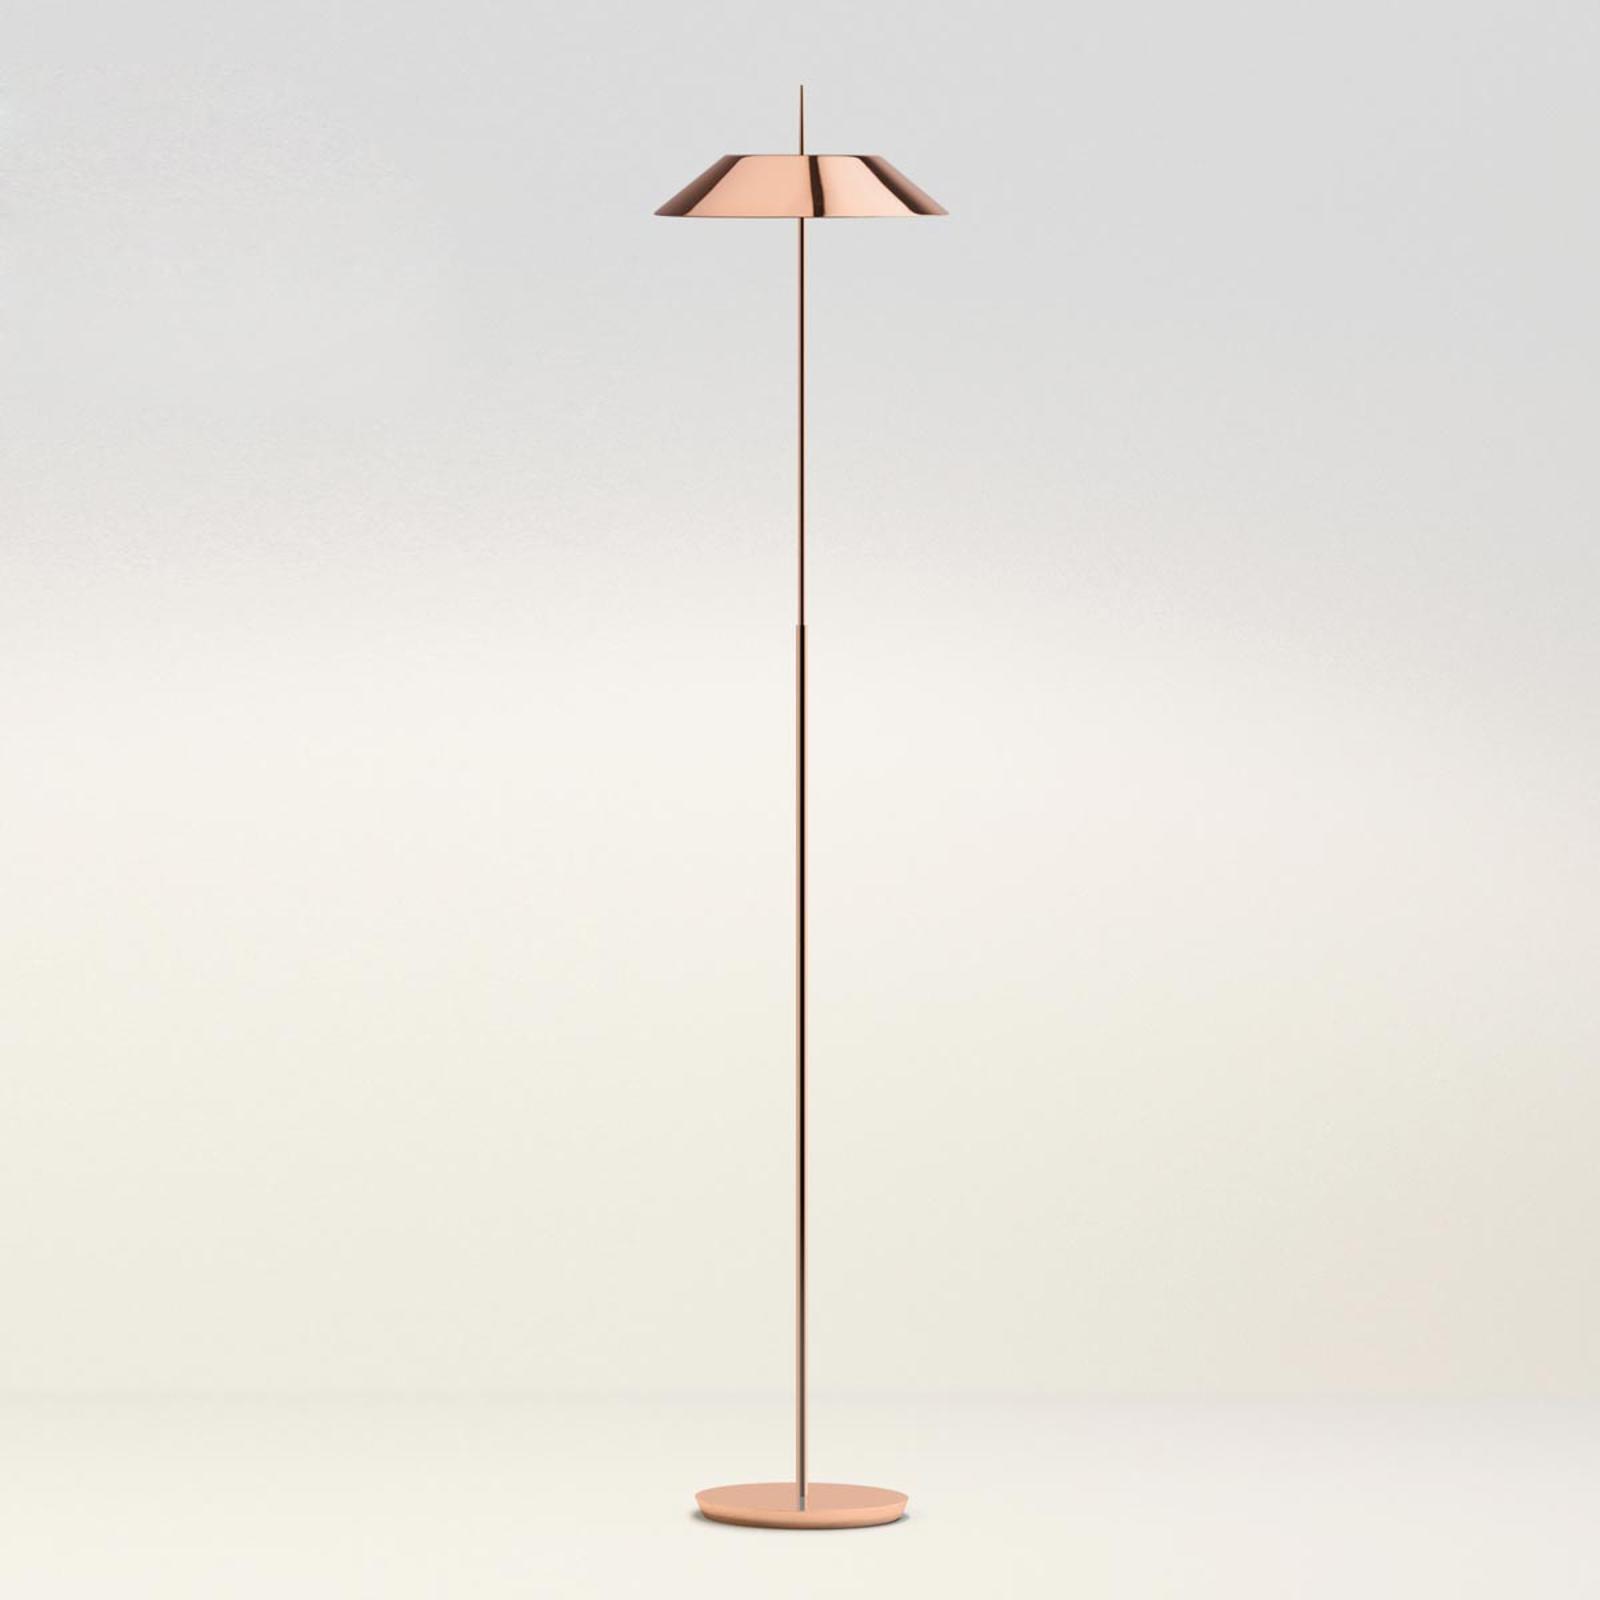 Beau lampadaire LED Mayfair, cuivre